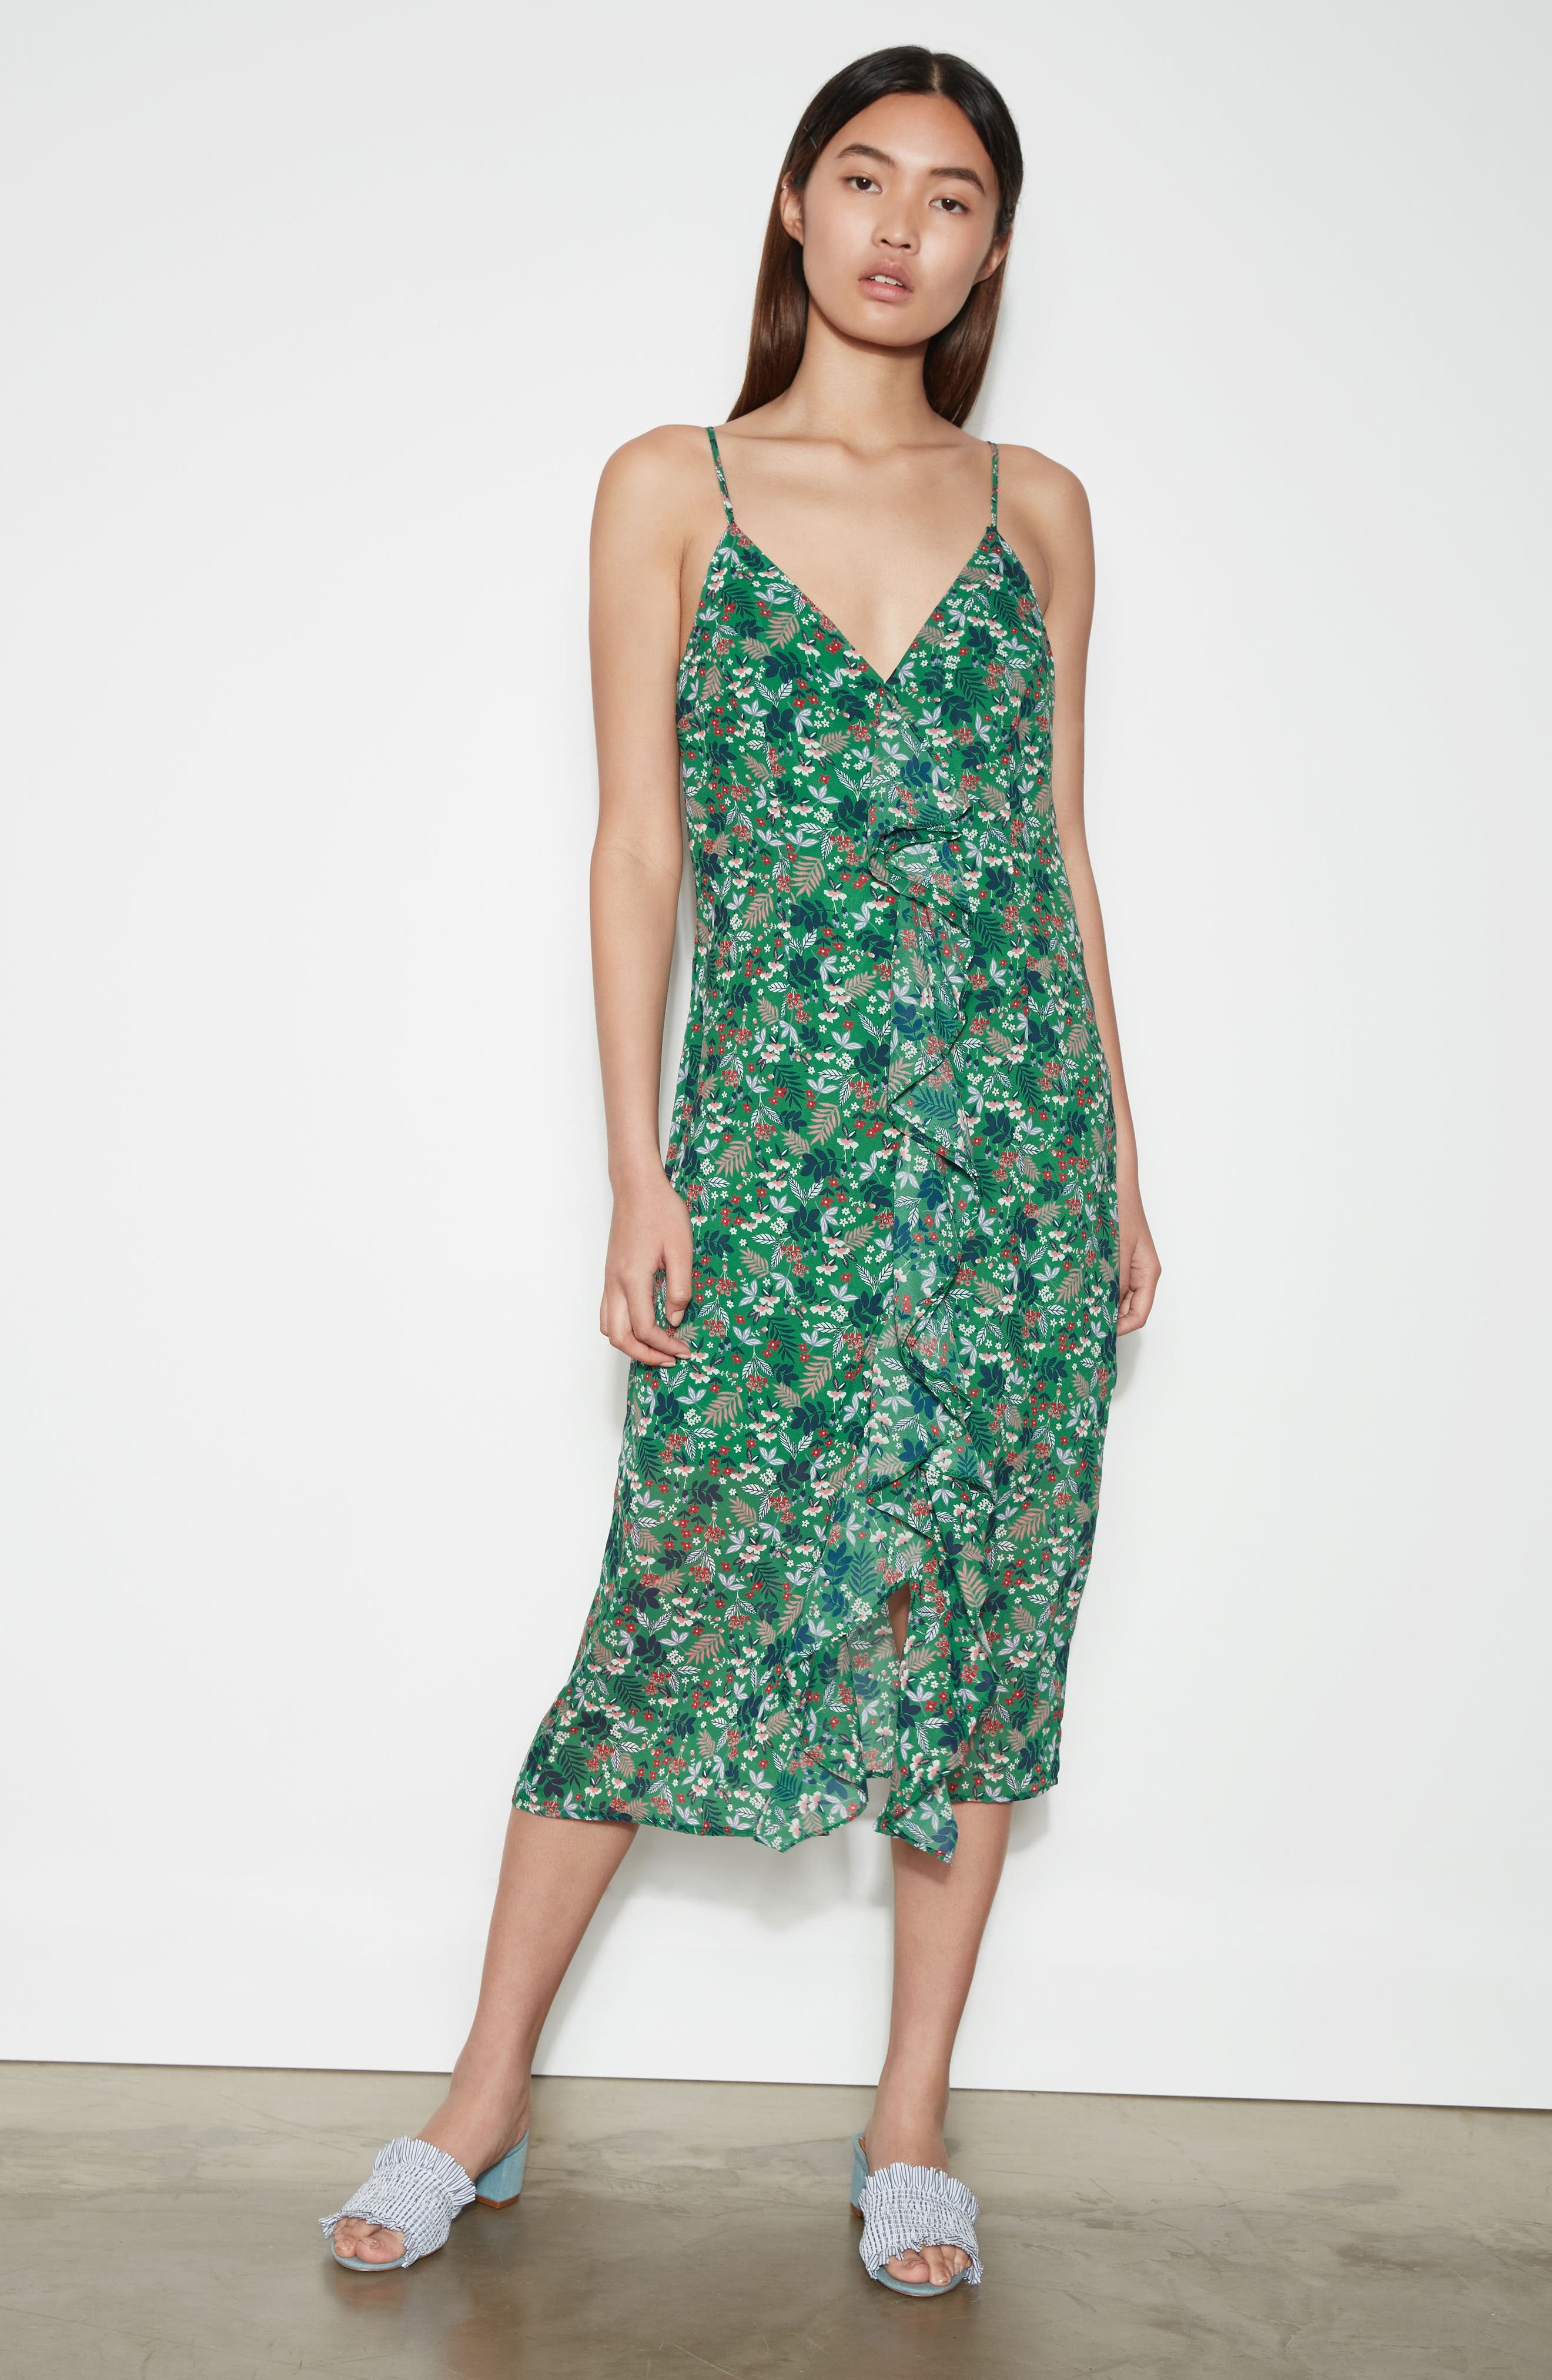 Viridian Ruffle Floral Print Dress,                             Alternate thumbnail 8, color,                             305